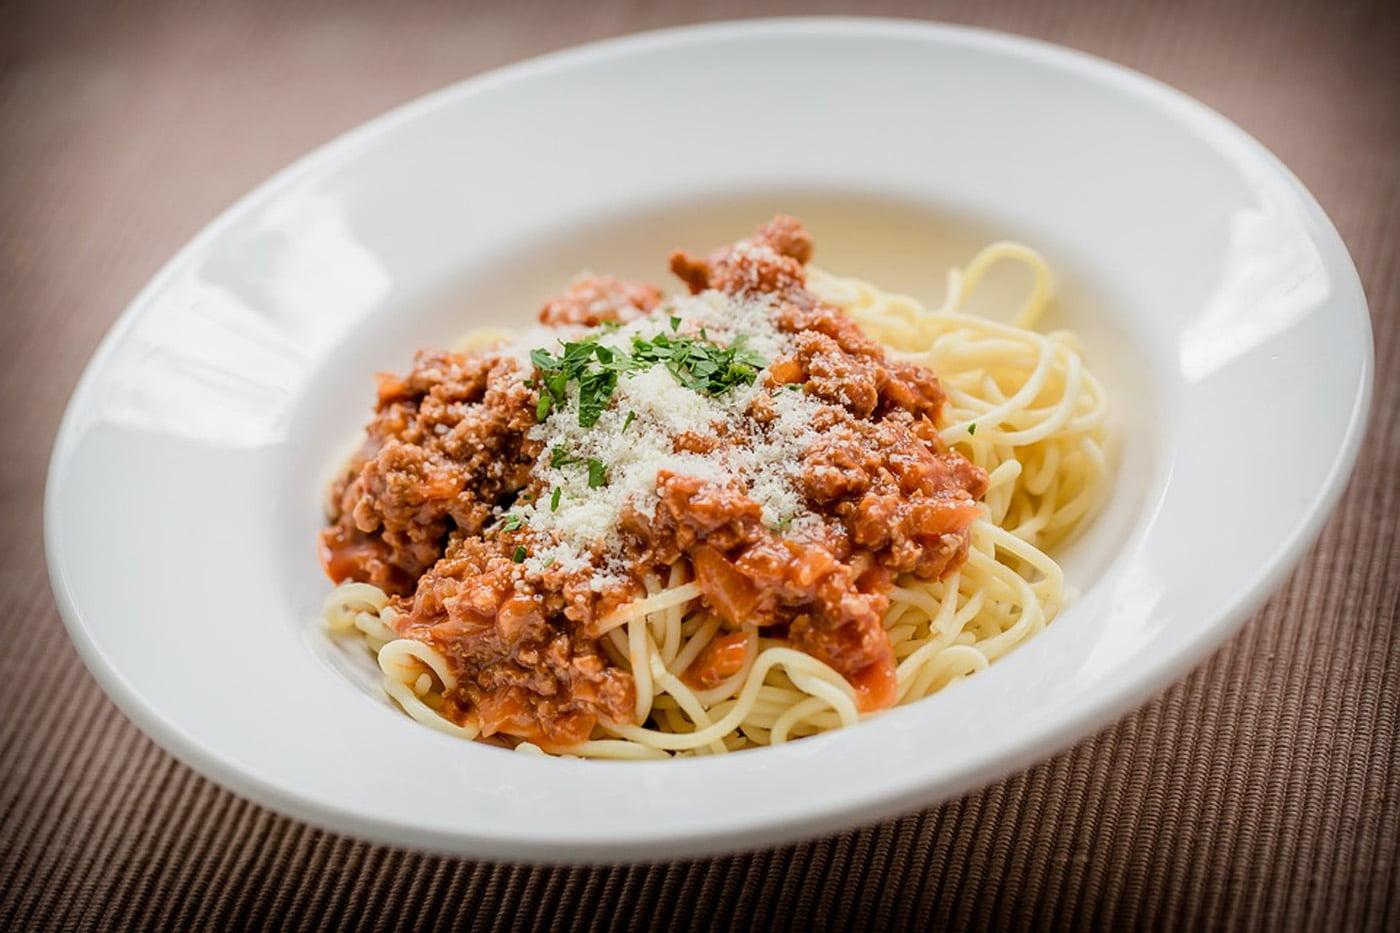 Freezer Friendly: Slow Cooker Spaghetti Bolognese